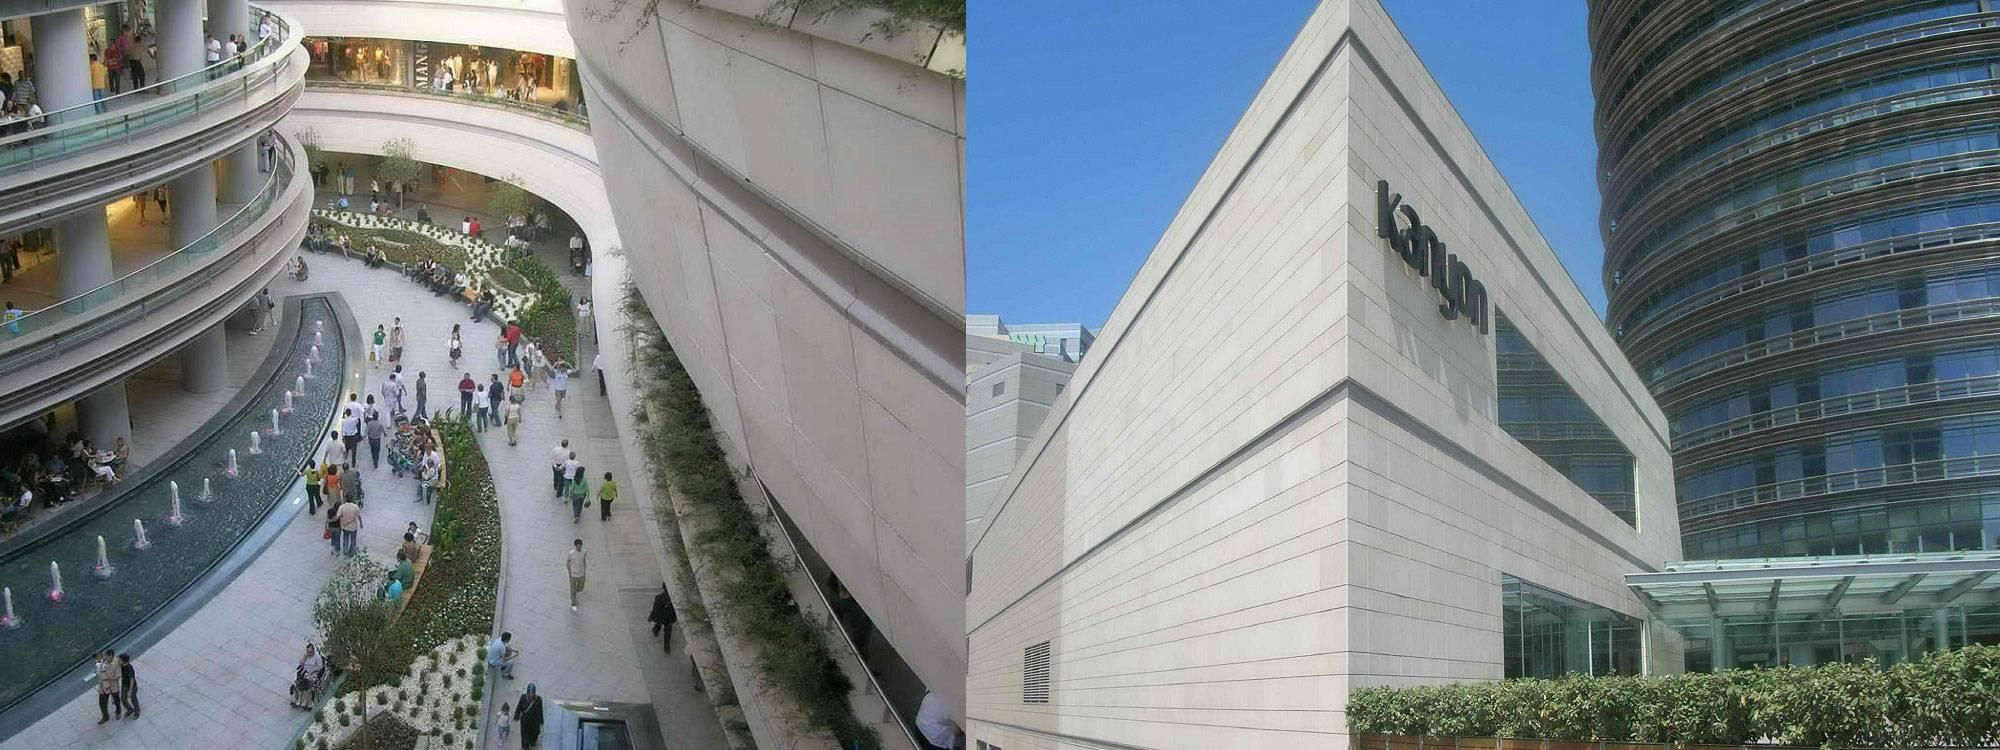 www.sonaykalelimimarlik.com SONAY KALELİ ALUMİNYUM CEPHE ÇÖZÜMLERİ & MİMARLIK, Sonay Kaleli Mimarlık